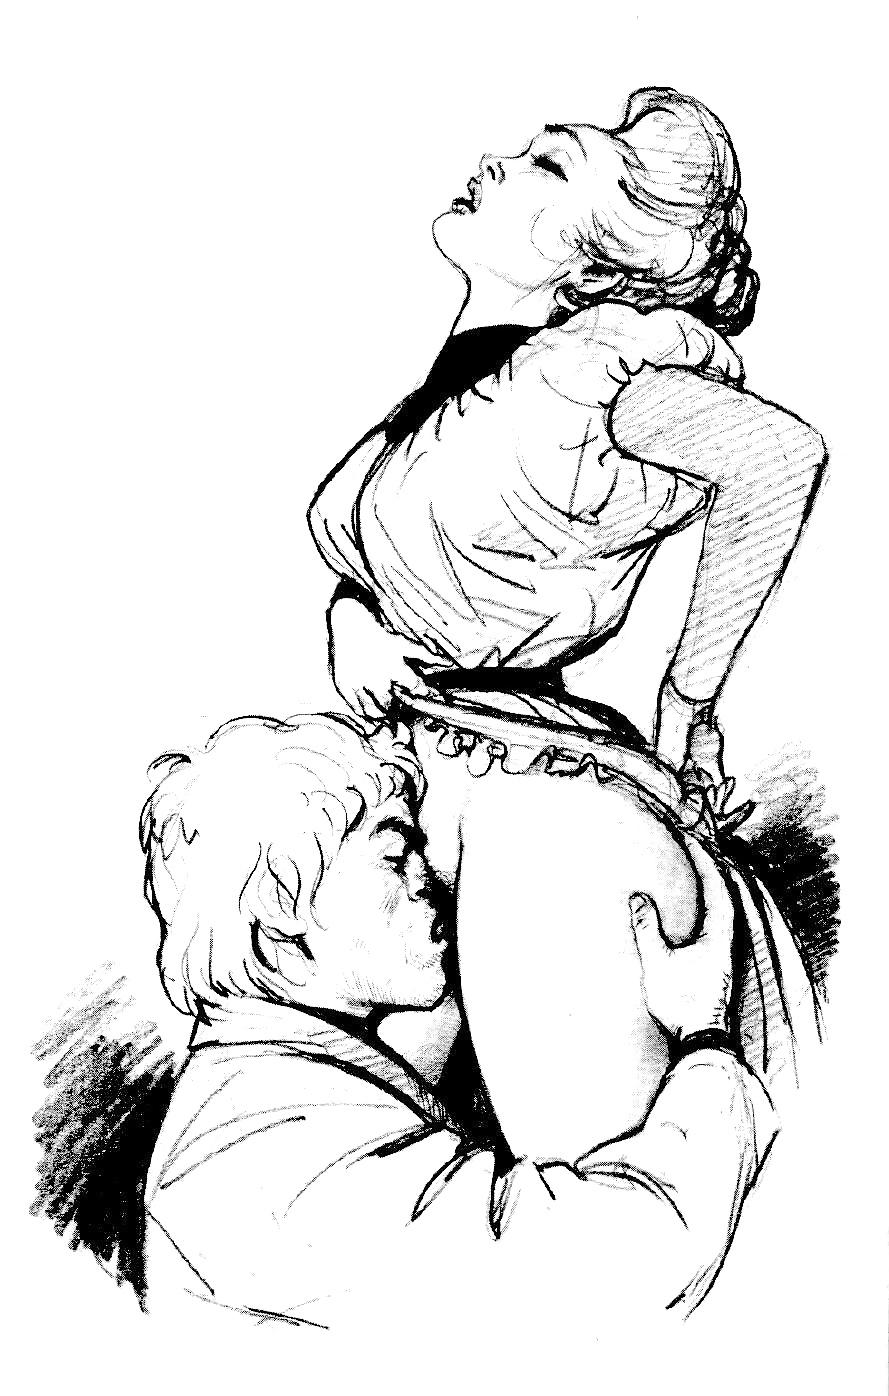 free-forced-cunnilingus-erotic-comics-squirting-bukake